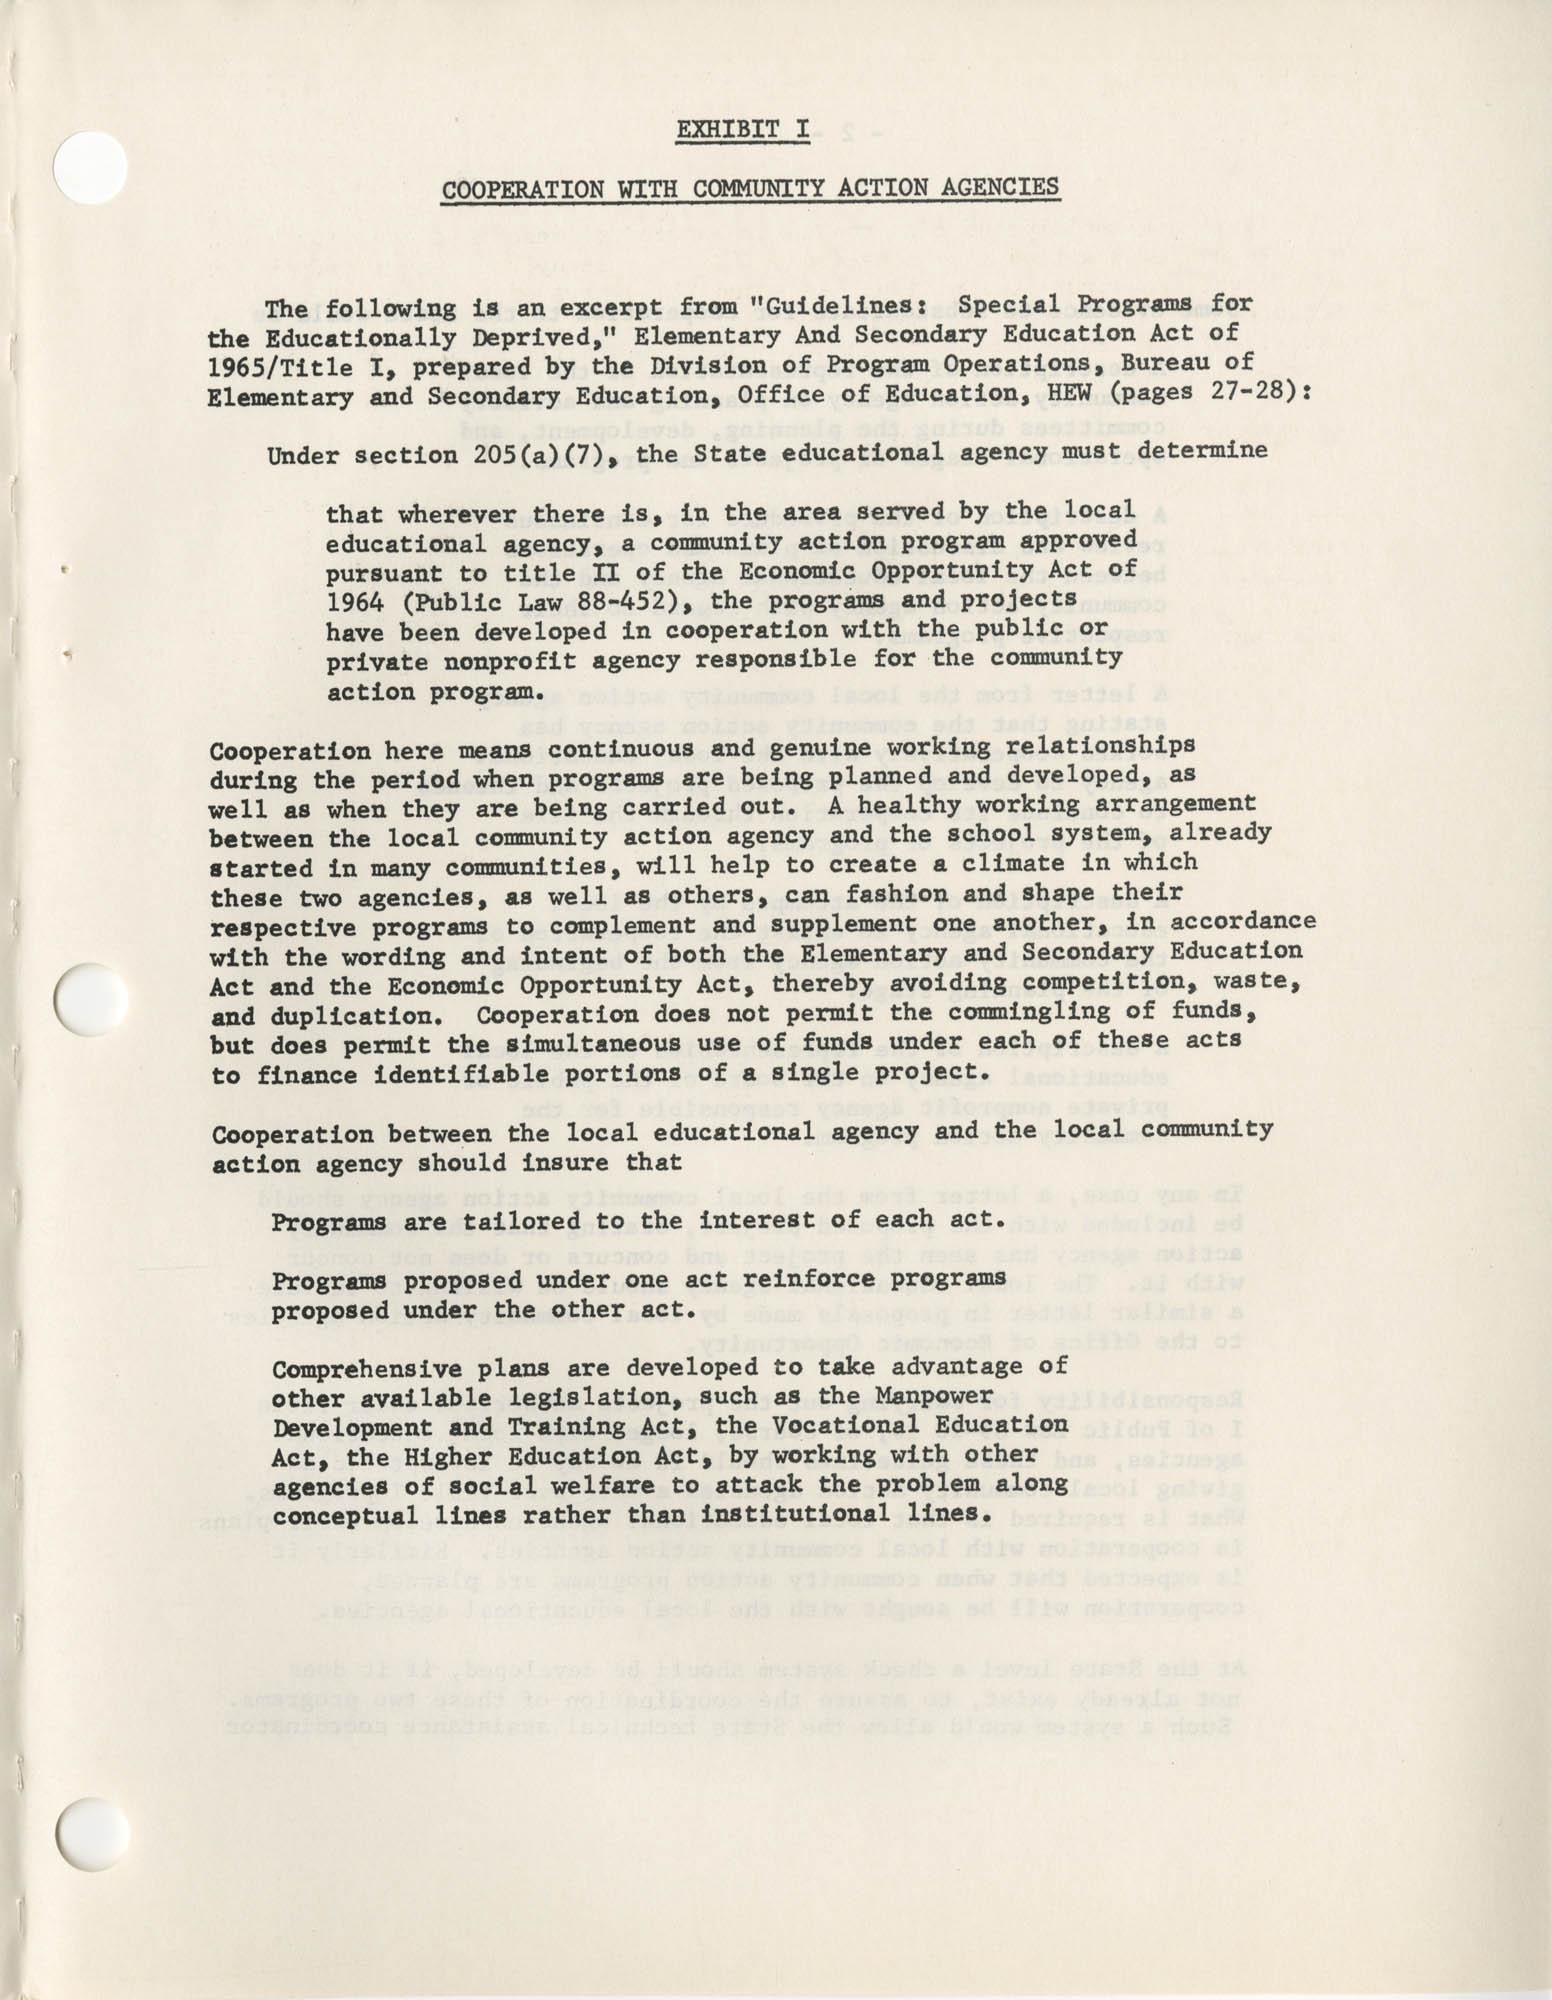 Community Action Program Memorandum No. 27, Exhibit 1 Page 1